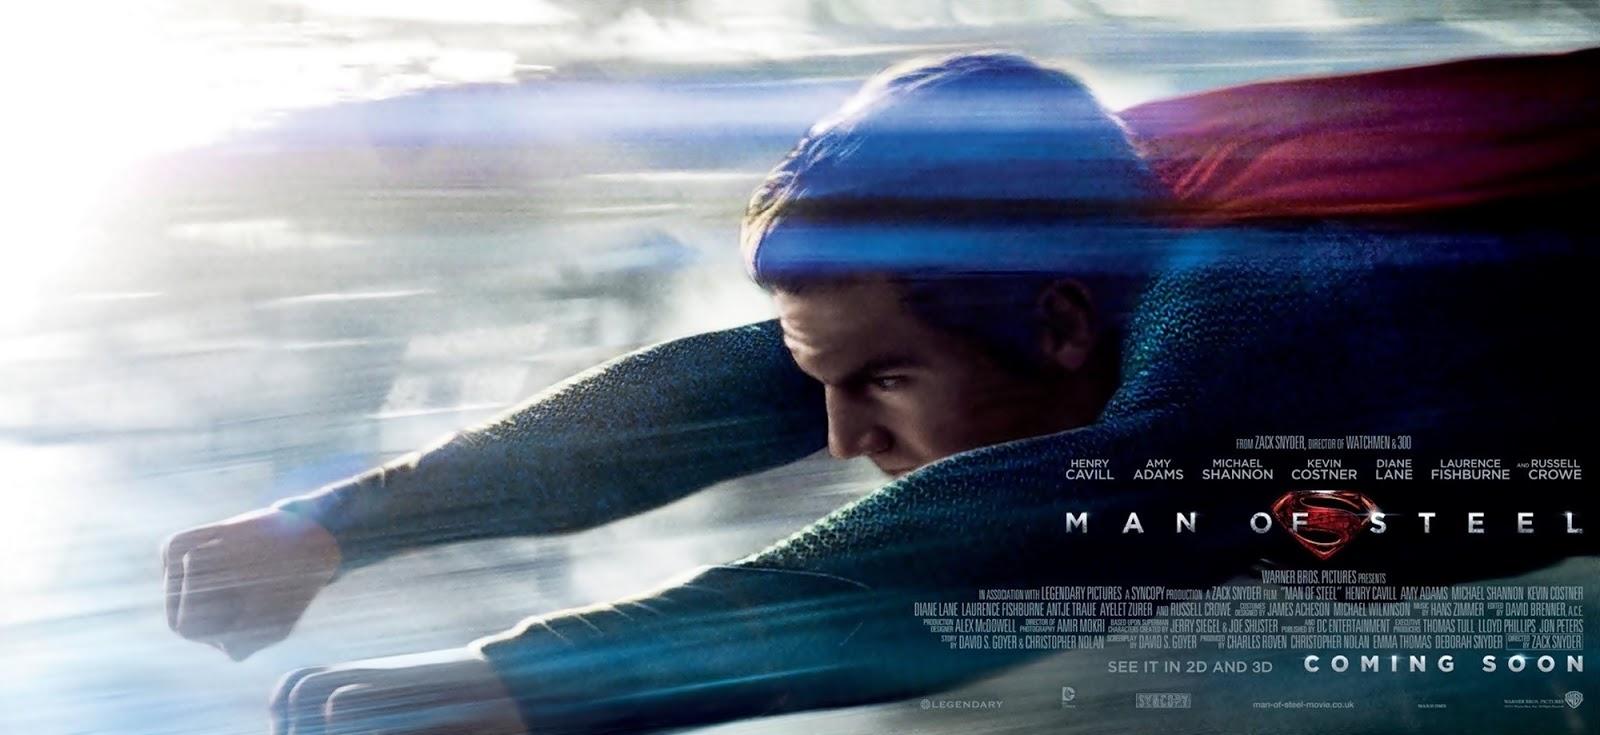 Man of Steel Movie Wallpapers - Wallwoods